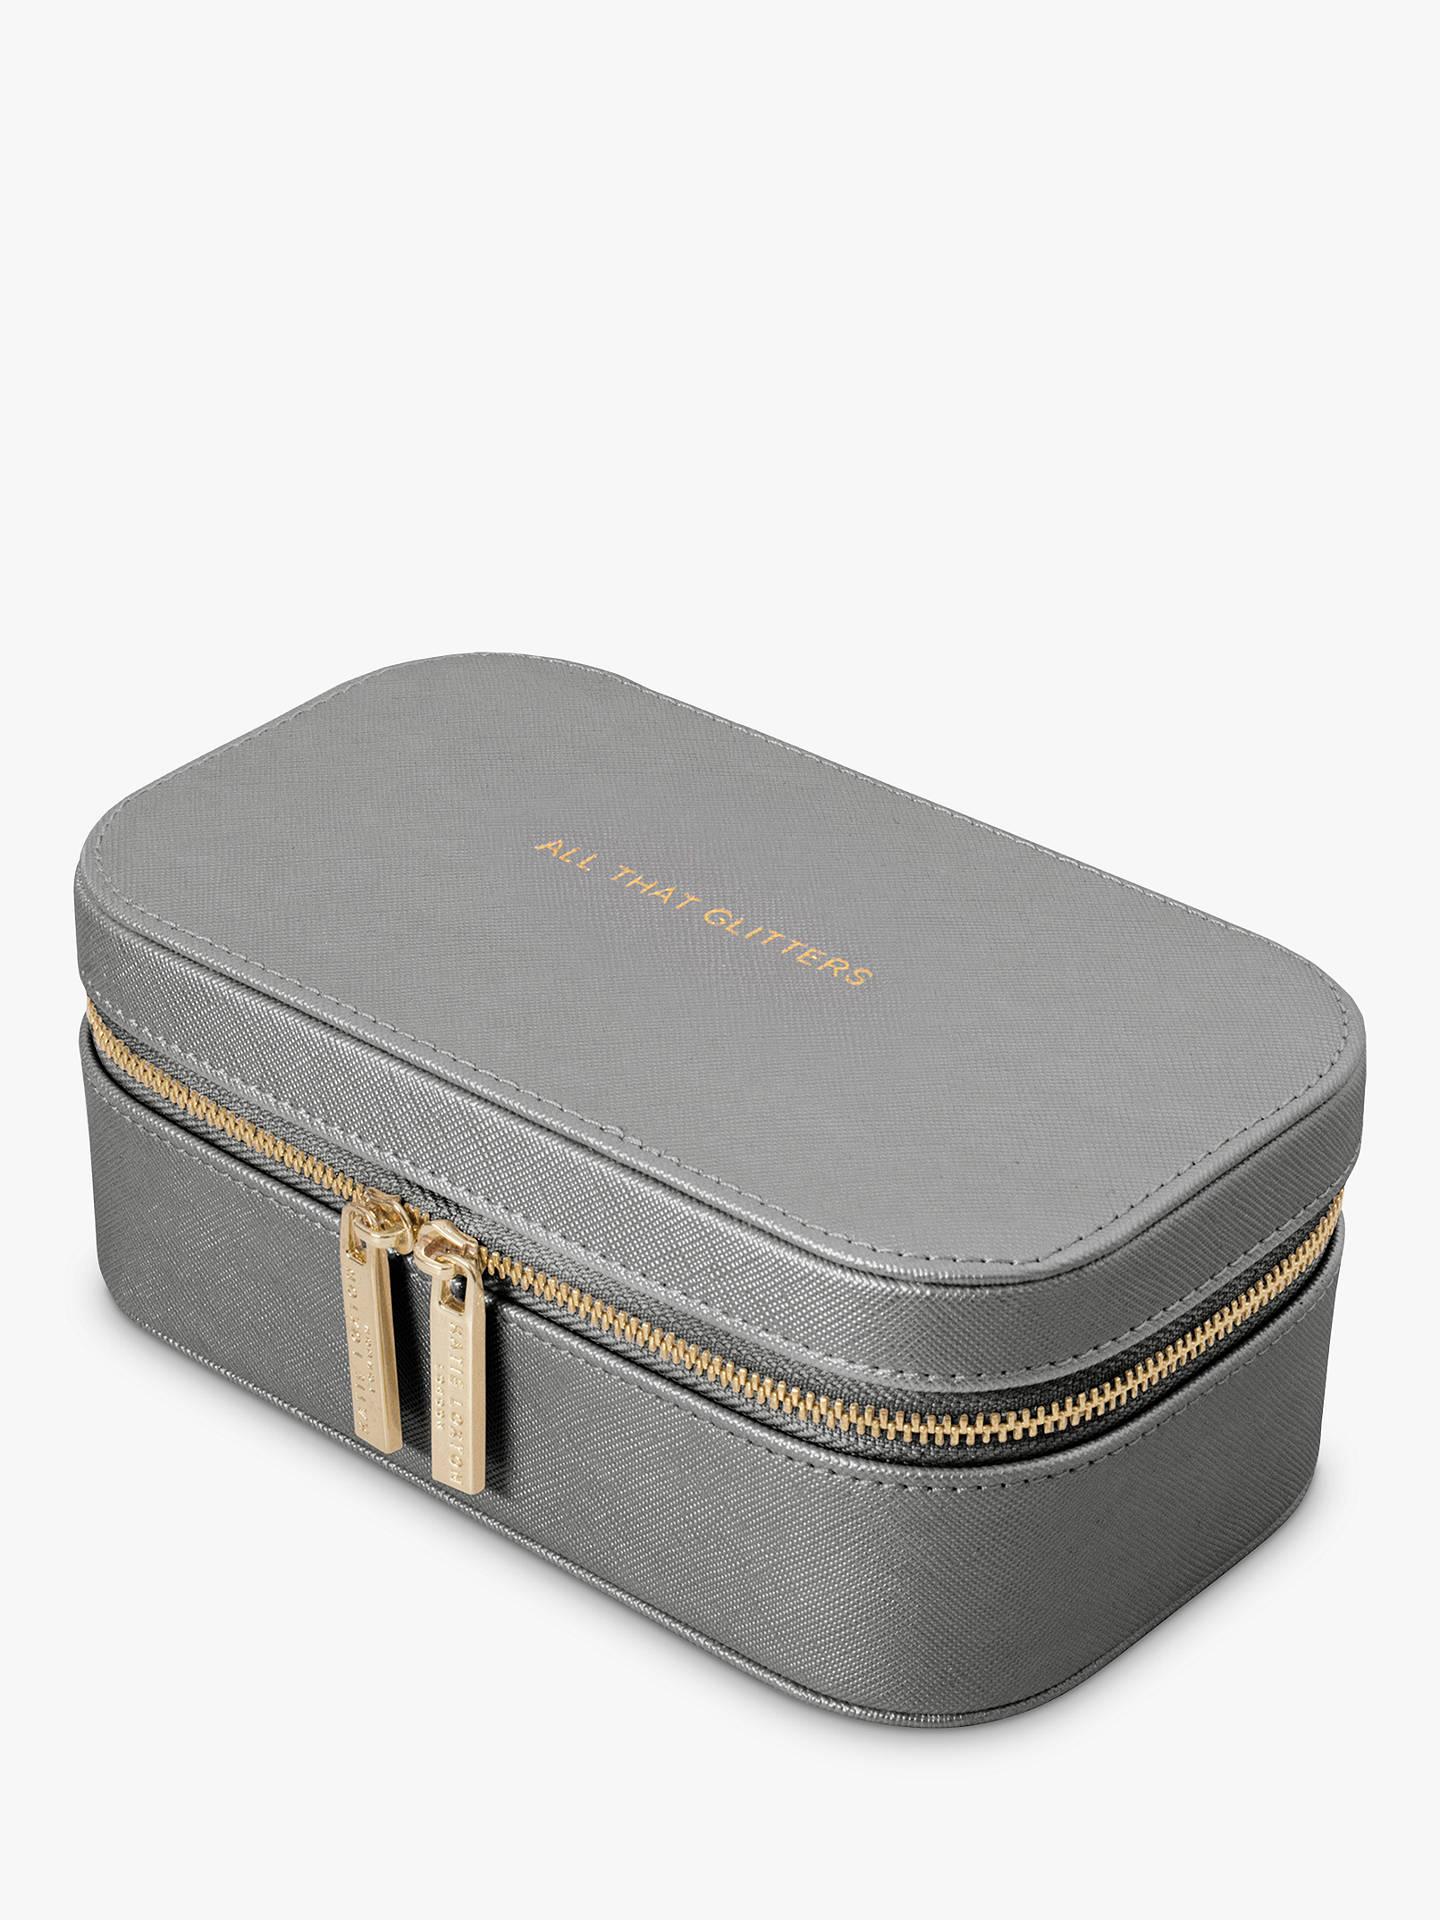 Katie Loxton Jewellery Box All That Glitters Grey At John Lewis